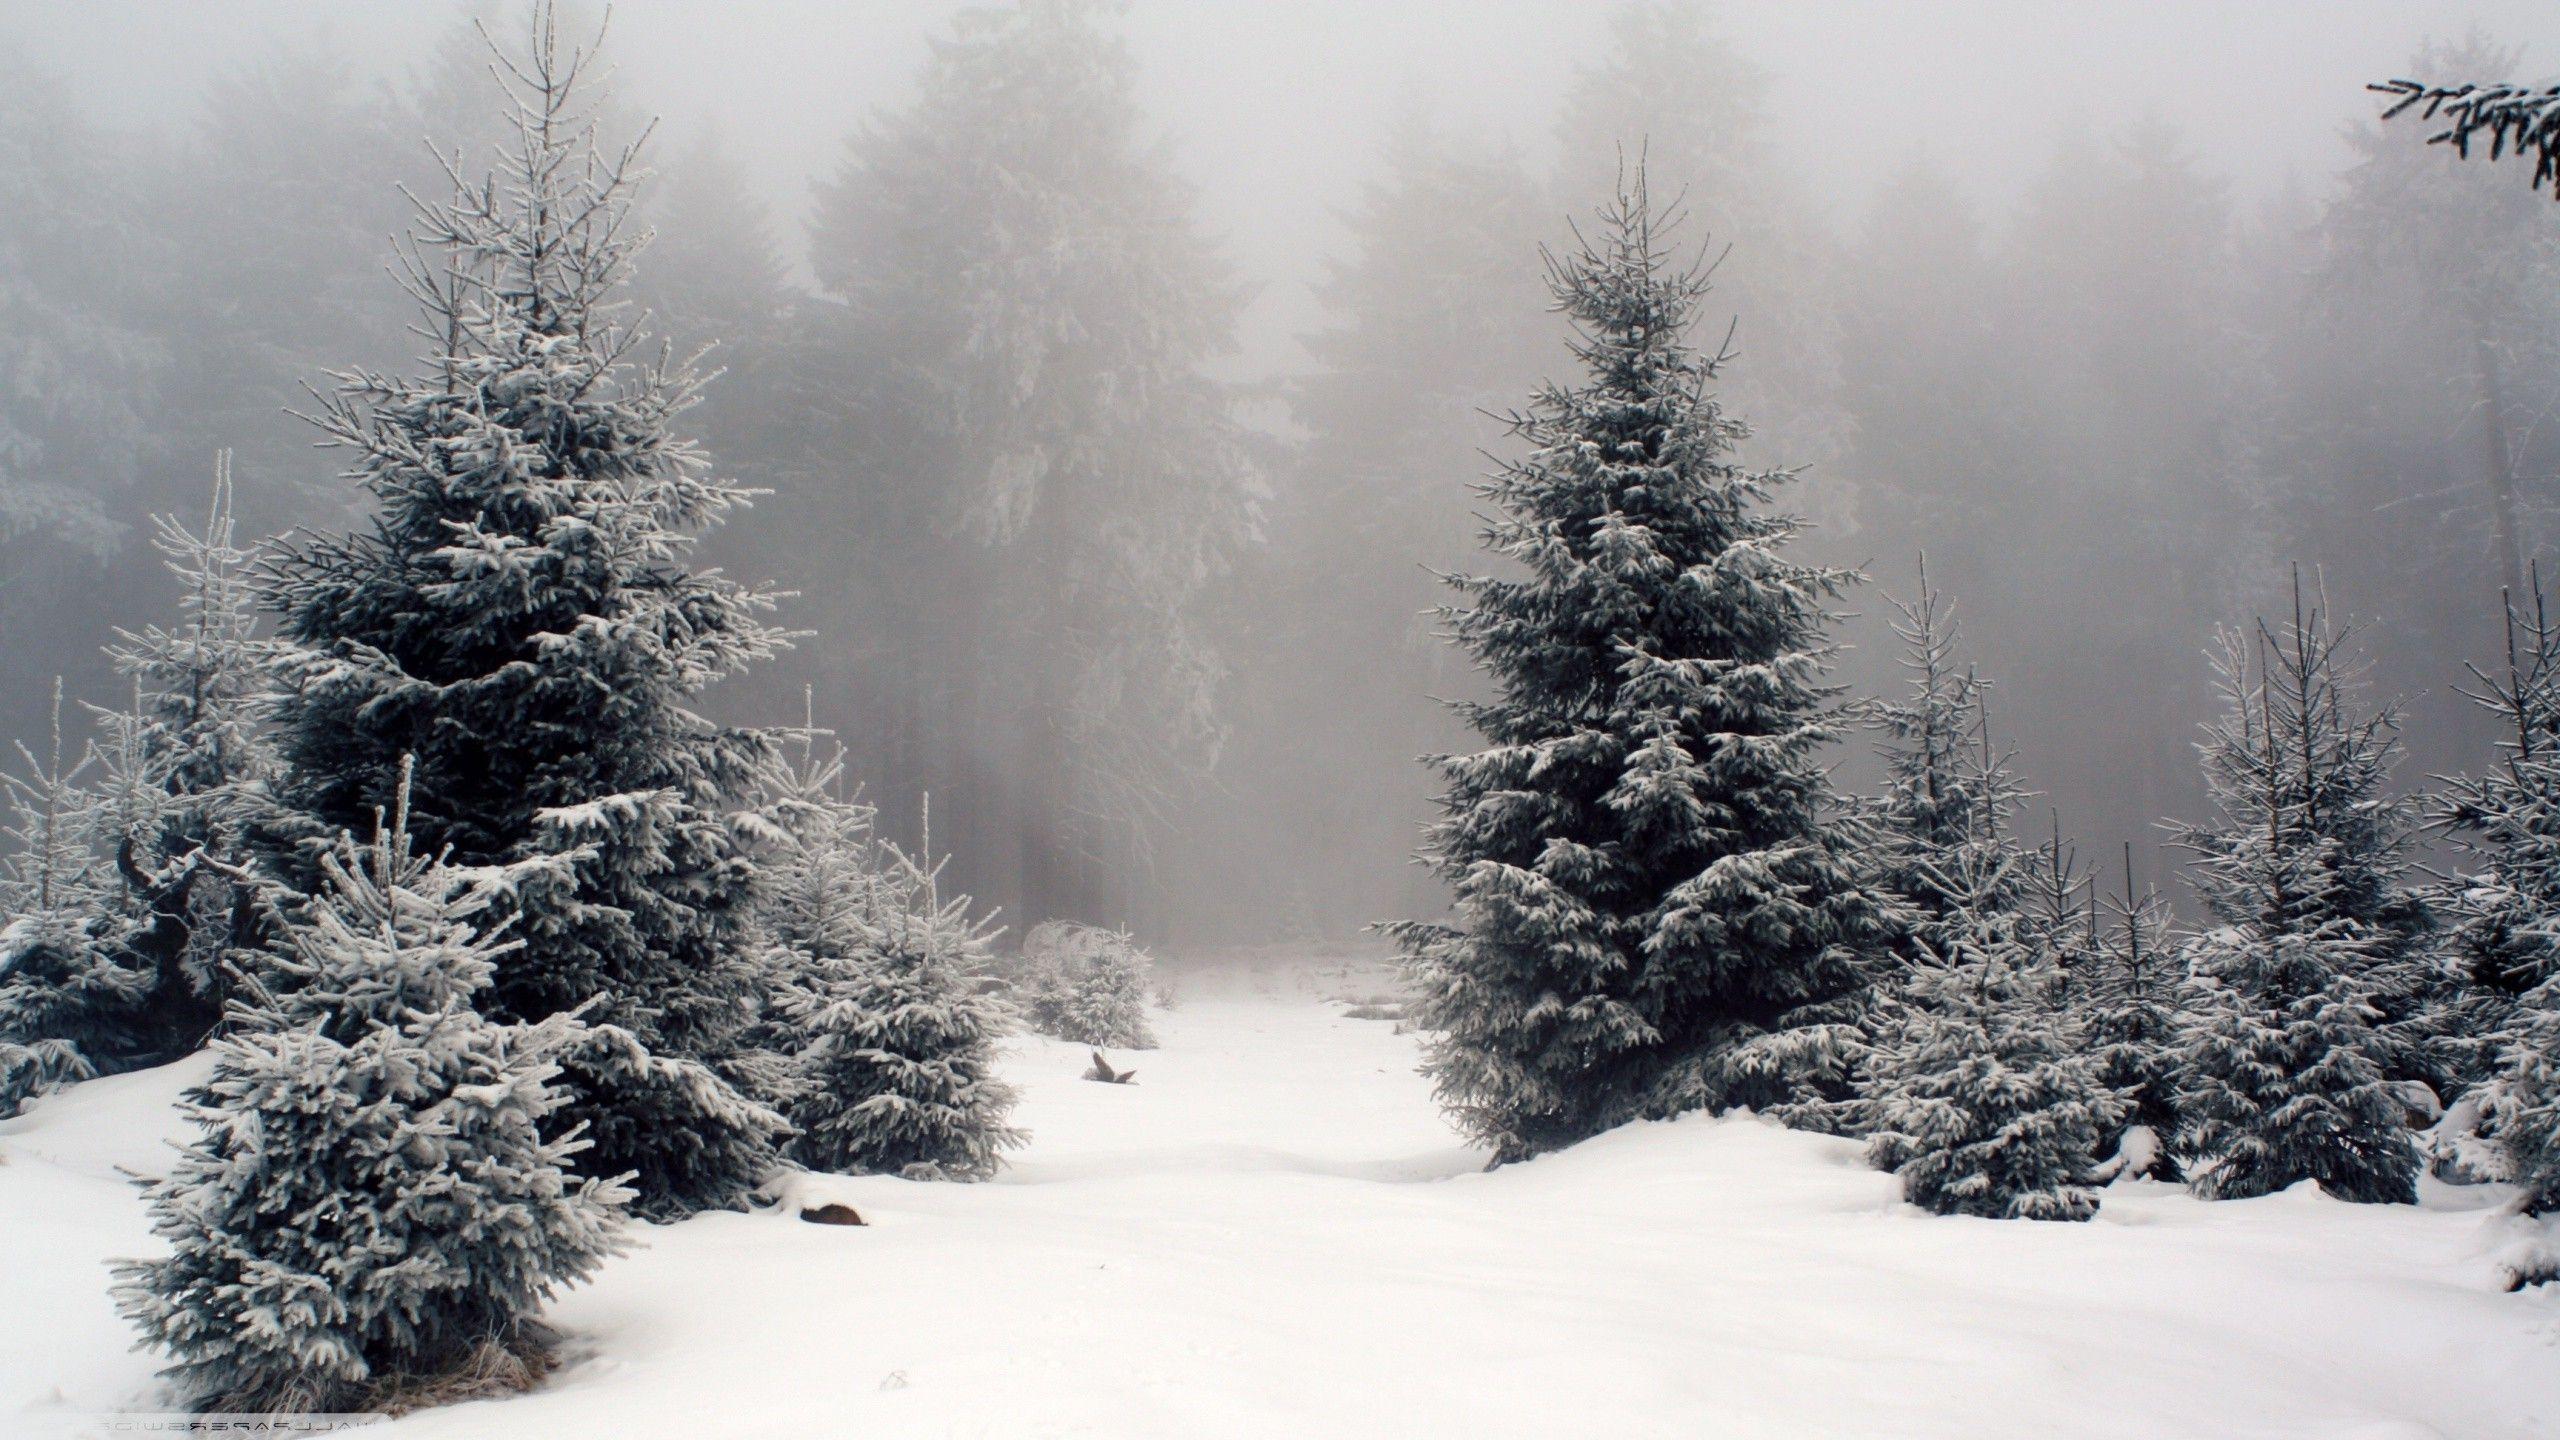 A Place In The Snow Winter Wallpaper Desktop Forest Wallpaper Winter Desktop Background Hd wallpaper snow winter forest trees